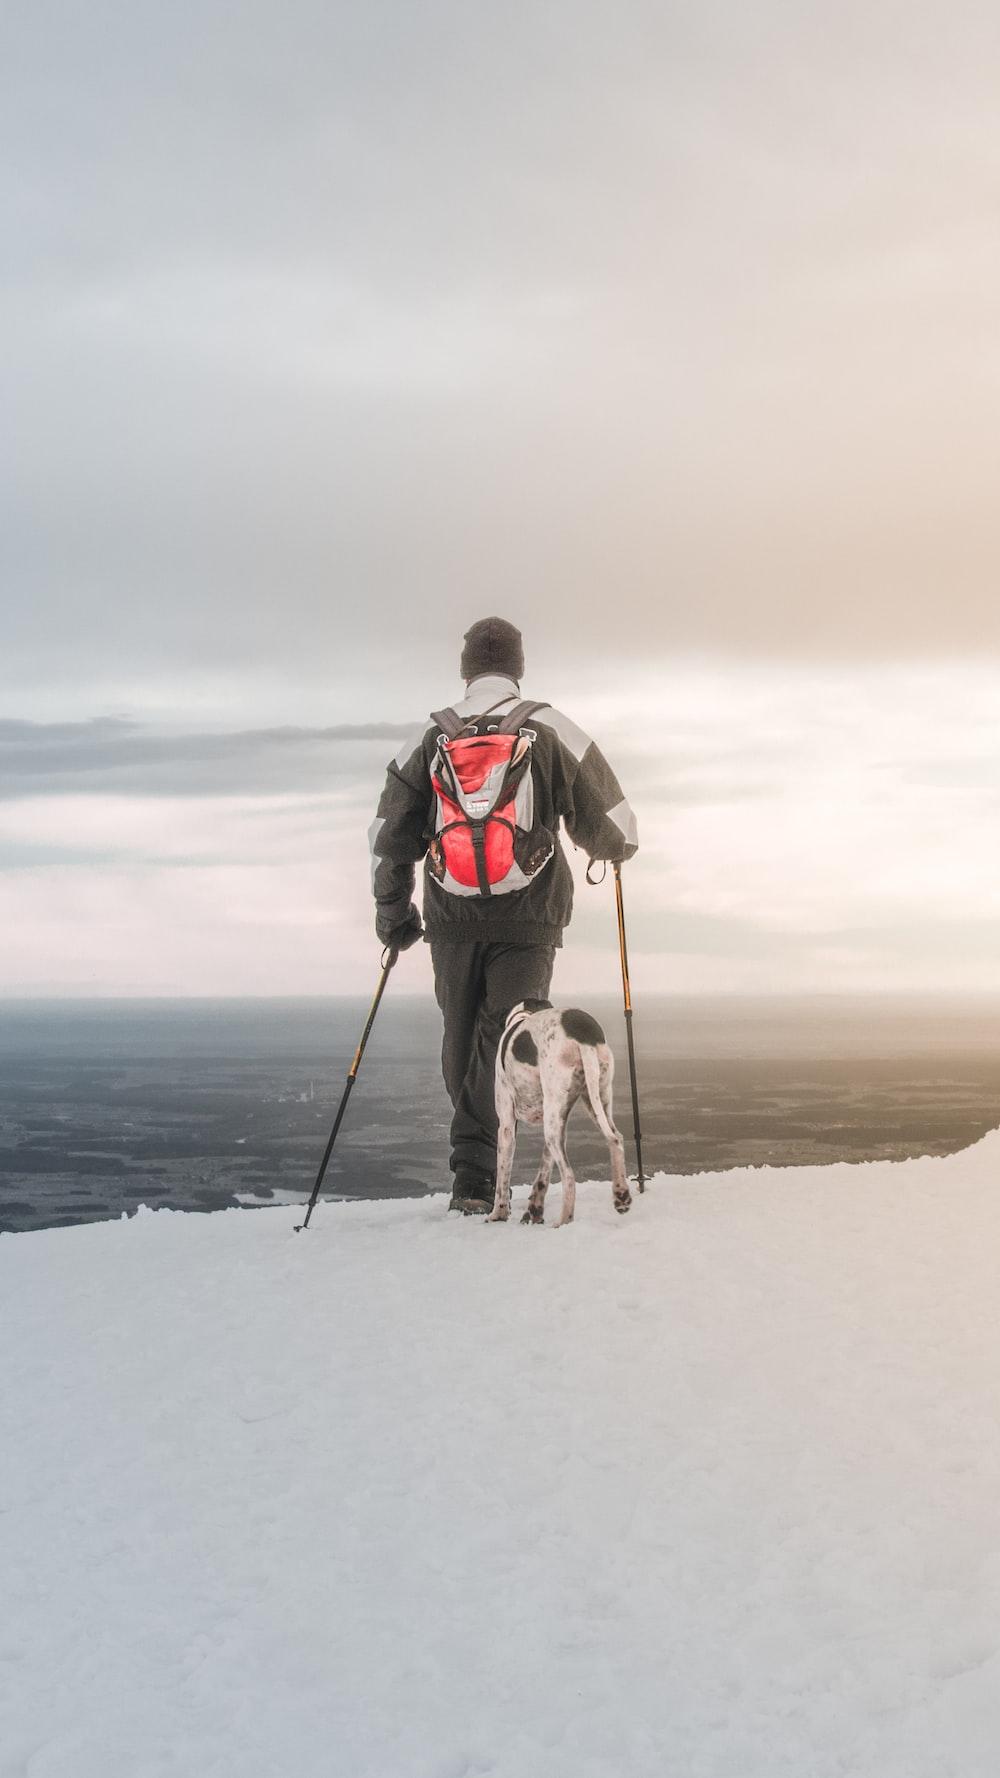 man hiking on frozen ground with dog